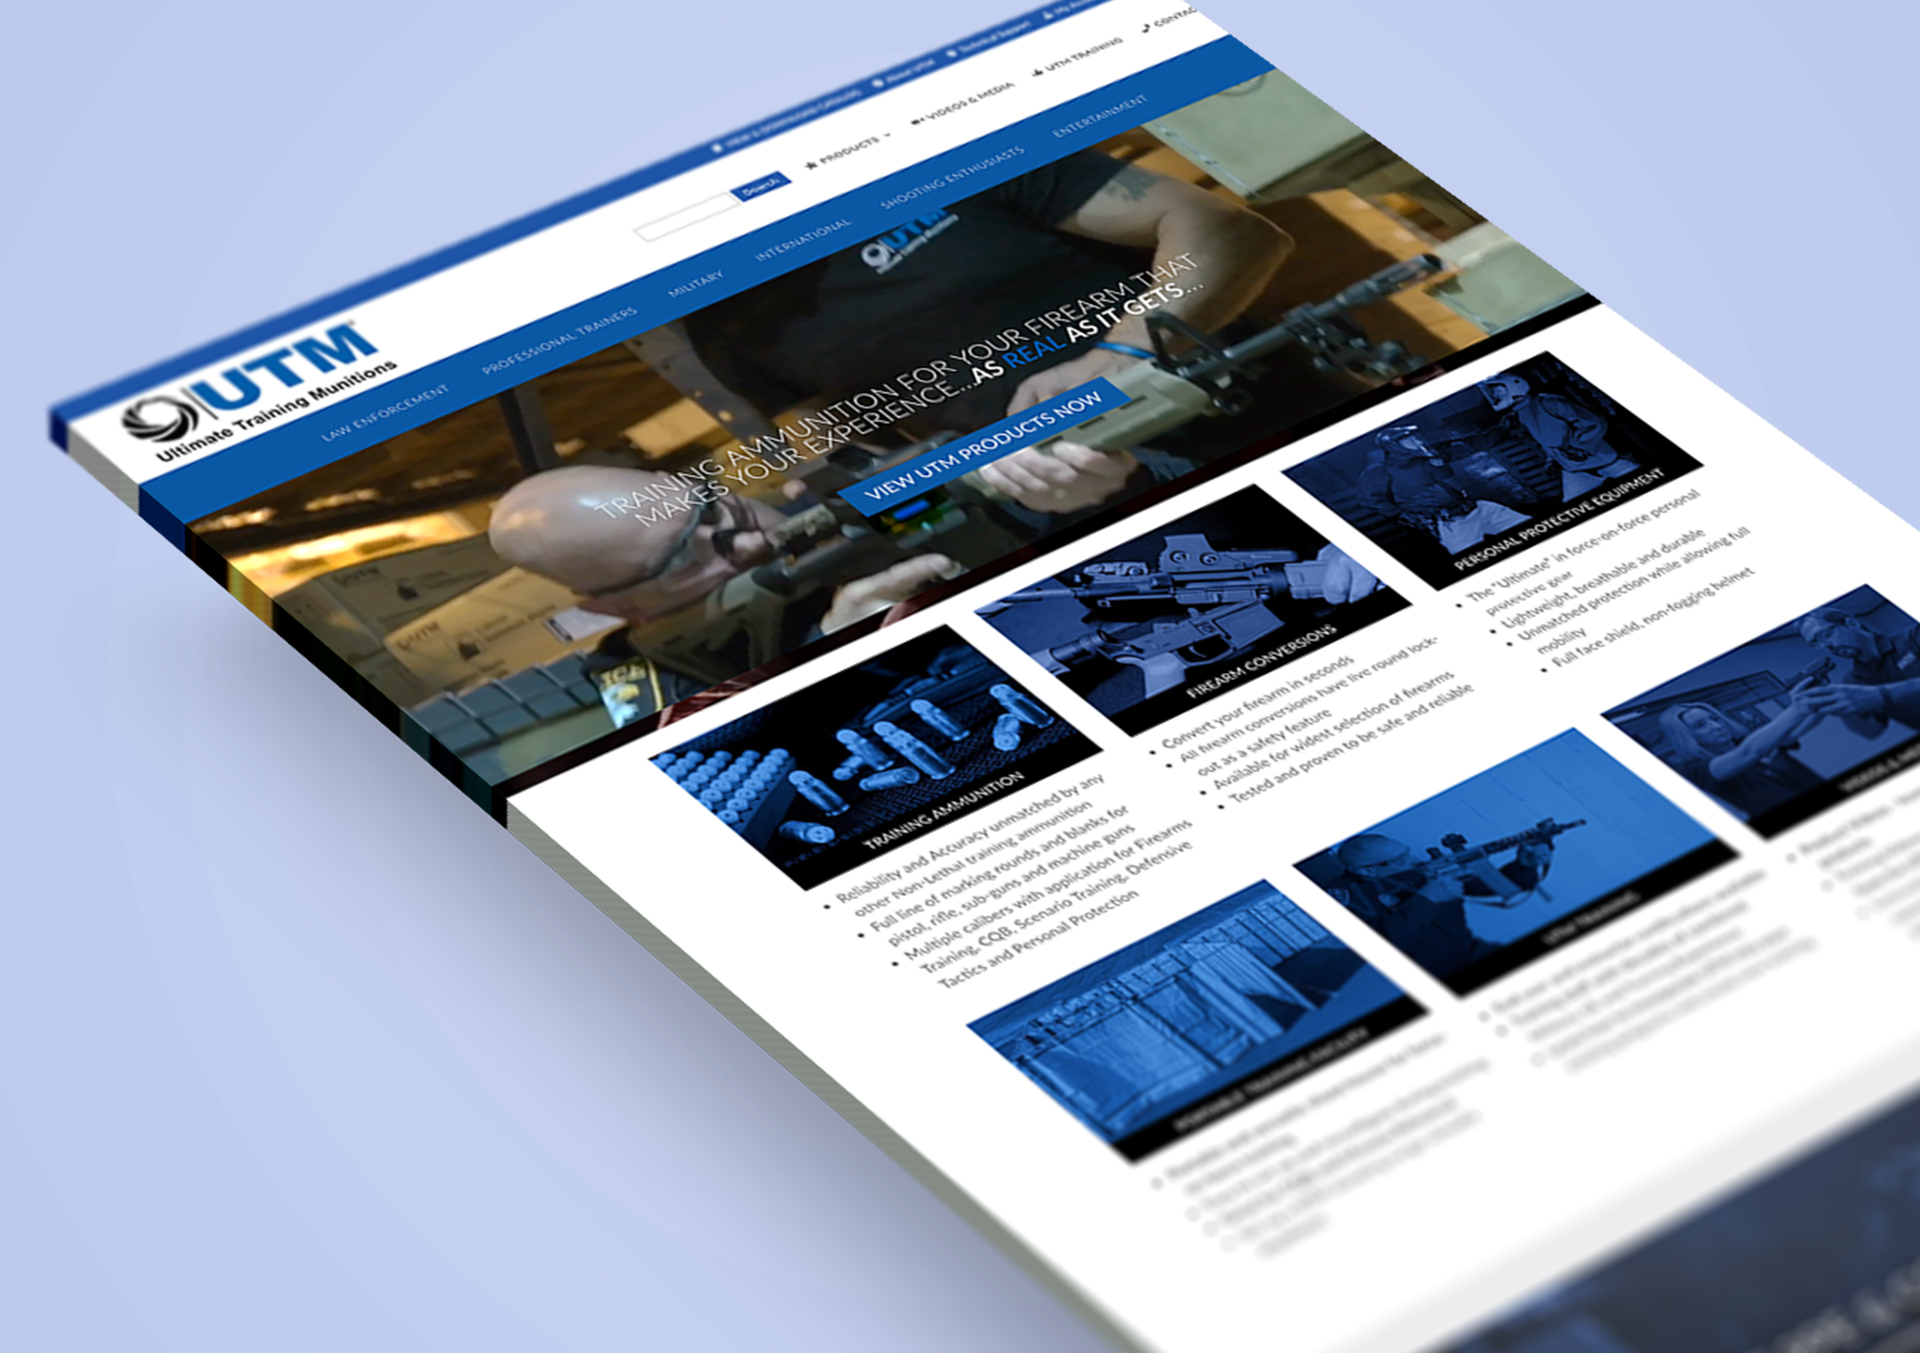 Ultimate Training Munitions » Phil Shaw » Branding » Web Design